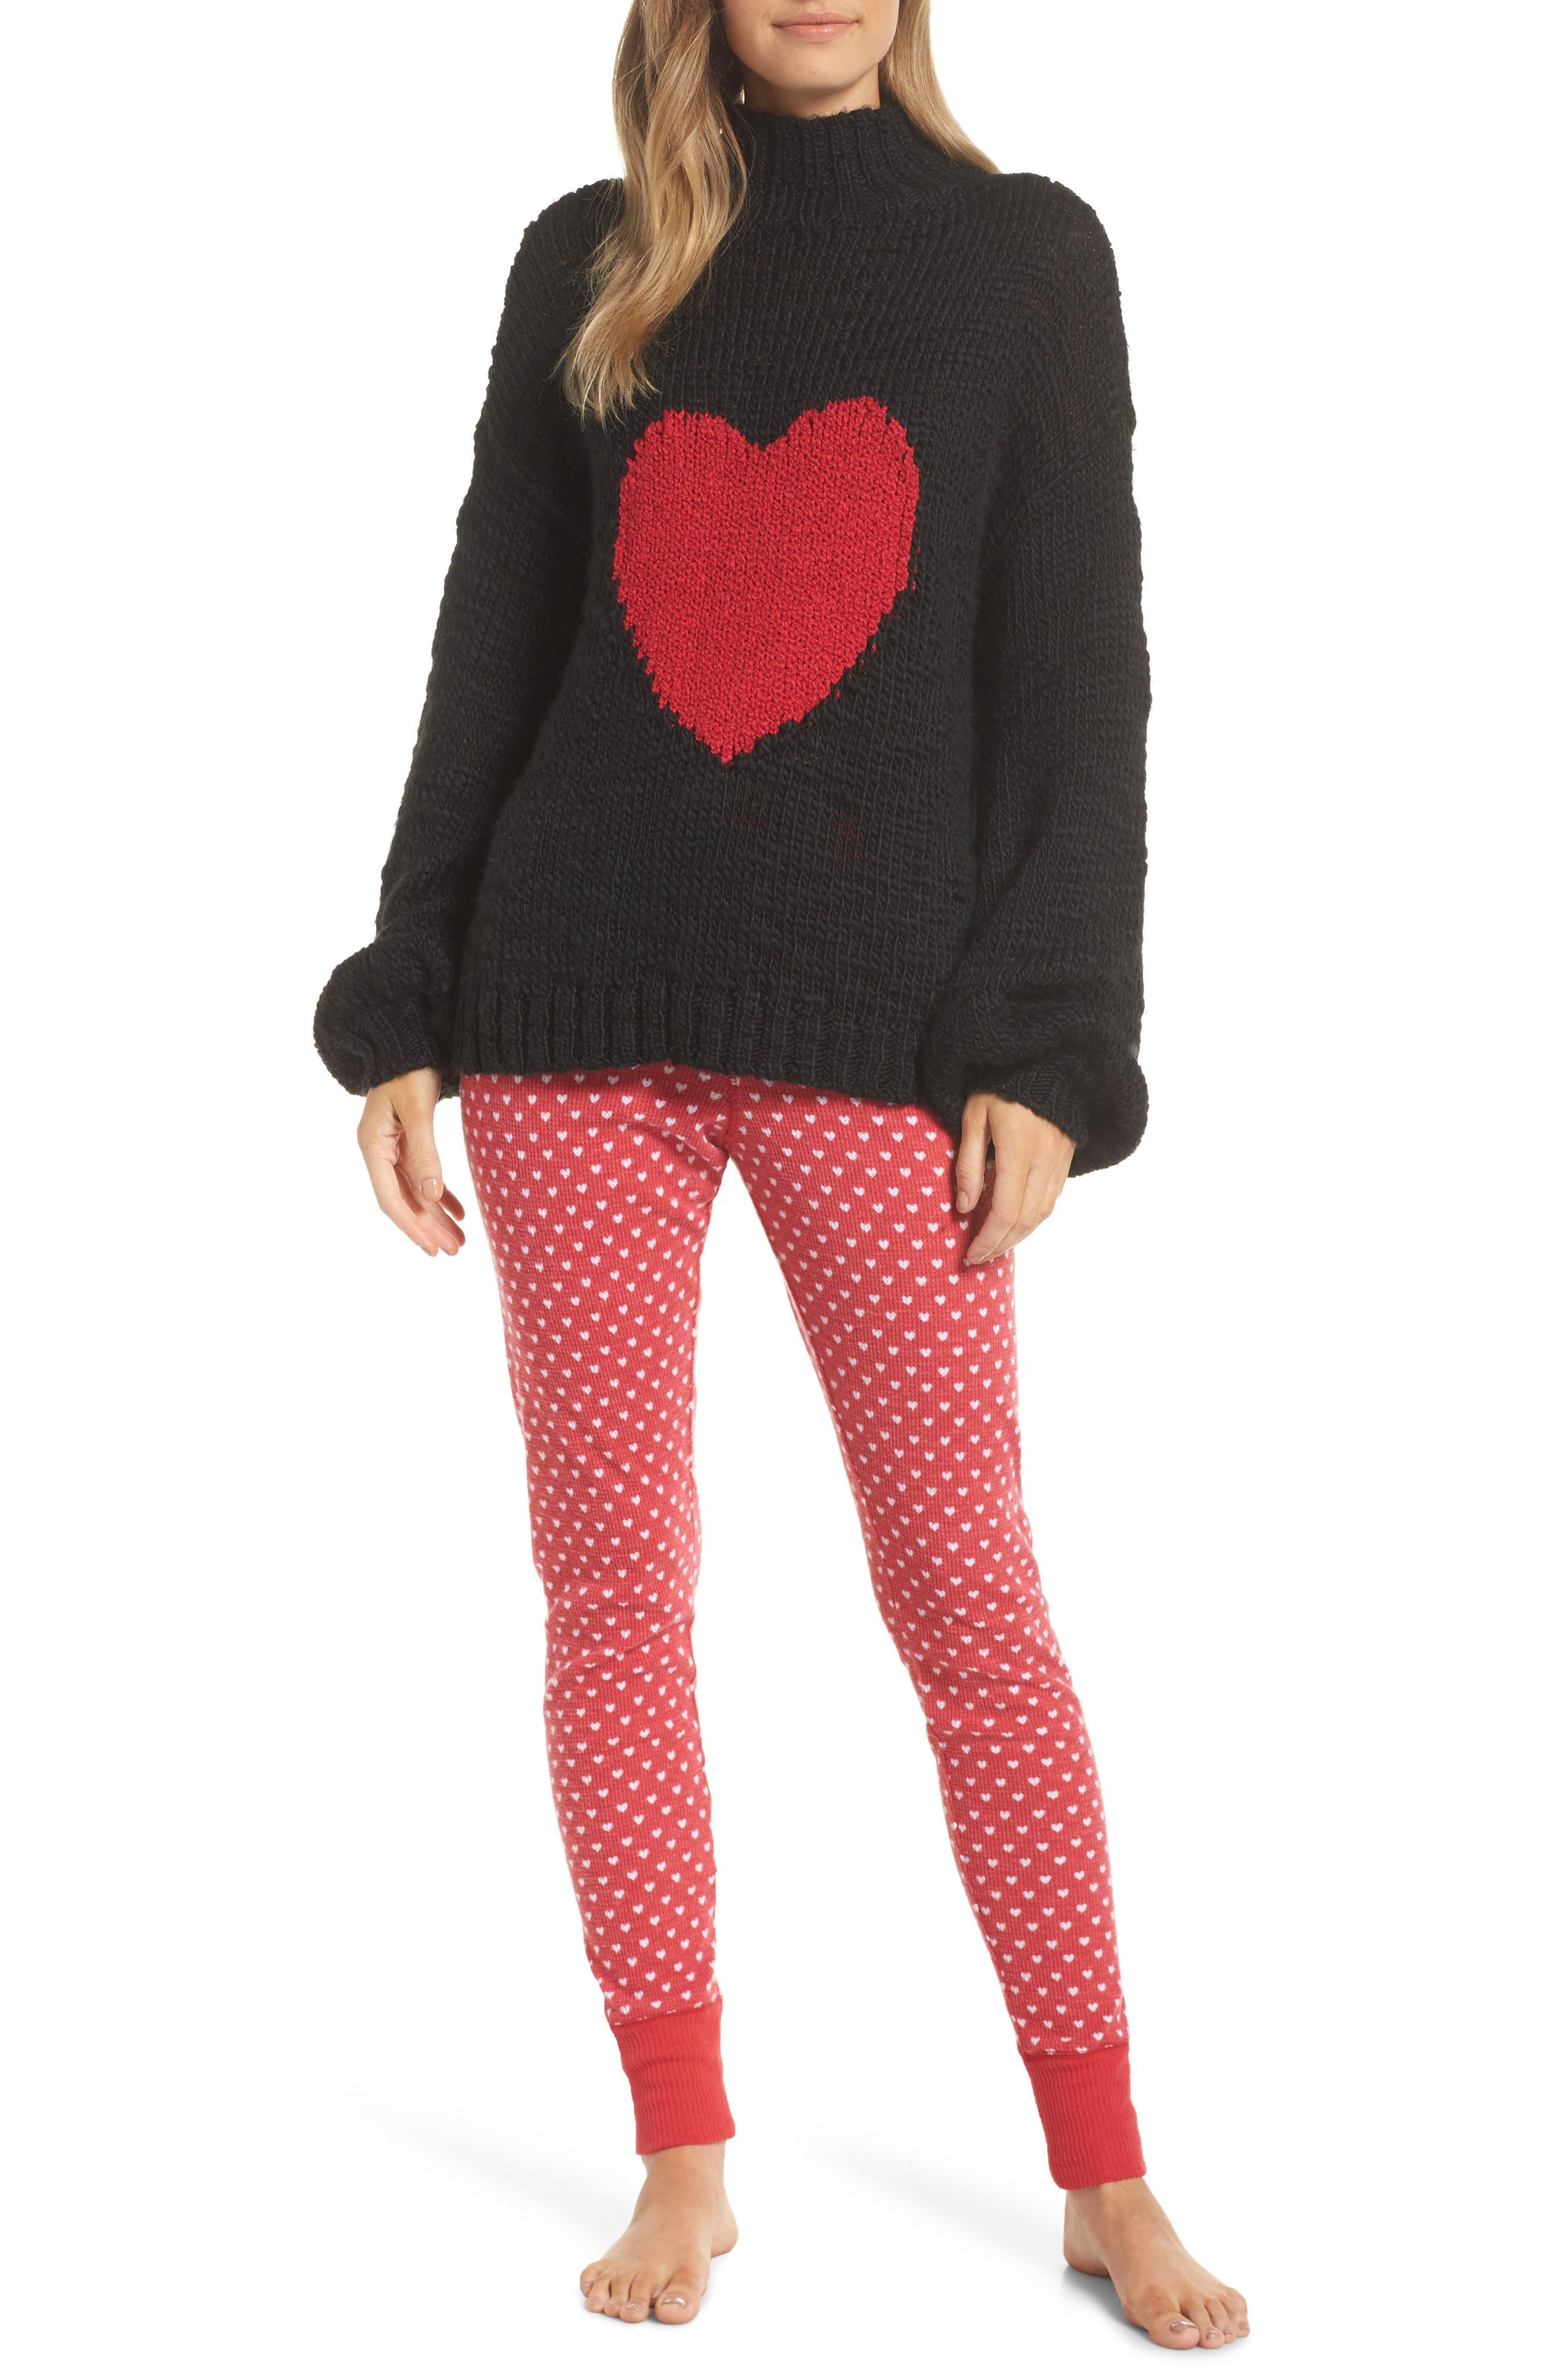 Thermal Leggings,                             Alternate thumbnail 7, color,                             RED LIPSTICK HEART